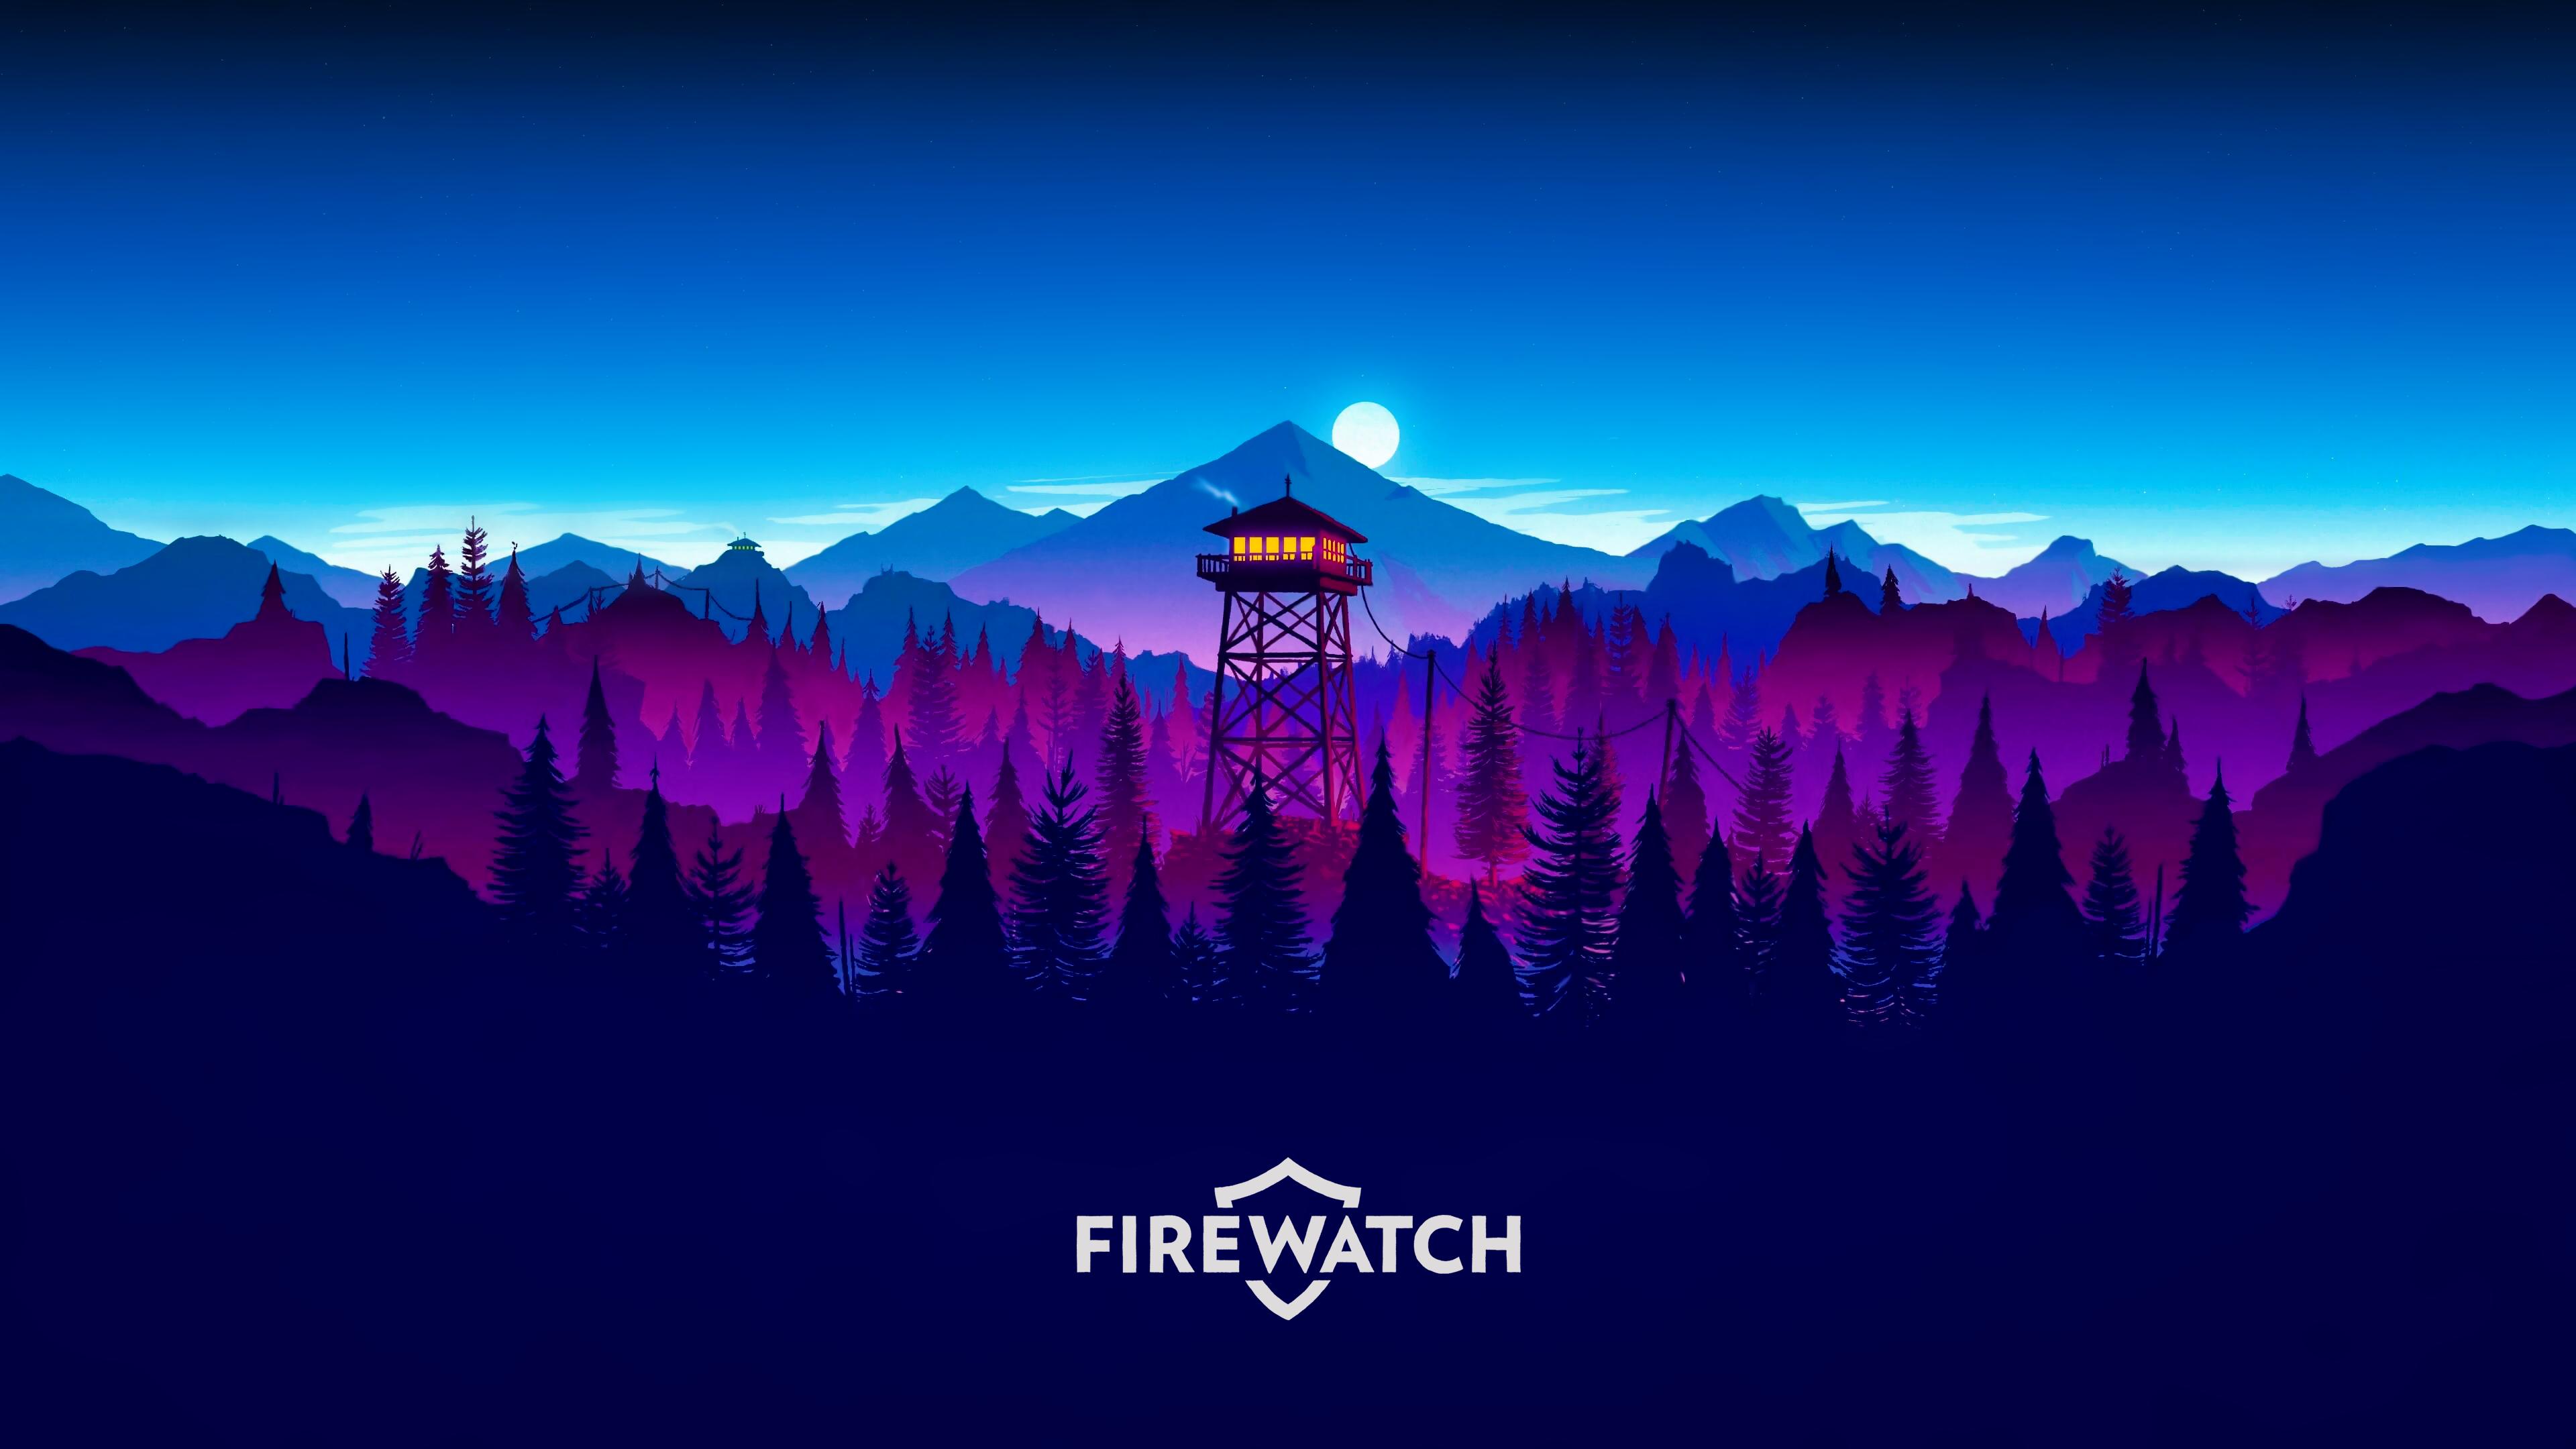 General 3840x2160 Firewatch video games forest nature landscape mountains sunset pine trees artwork digital art illustration Olly Moss Gamer